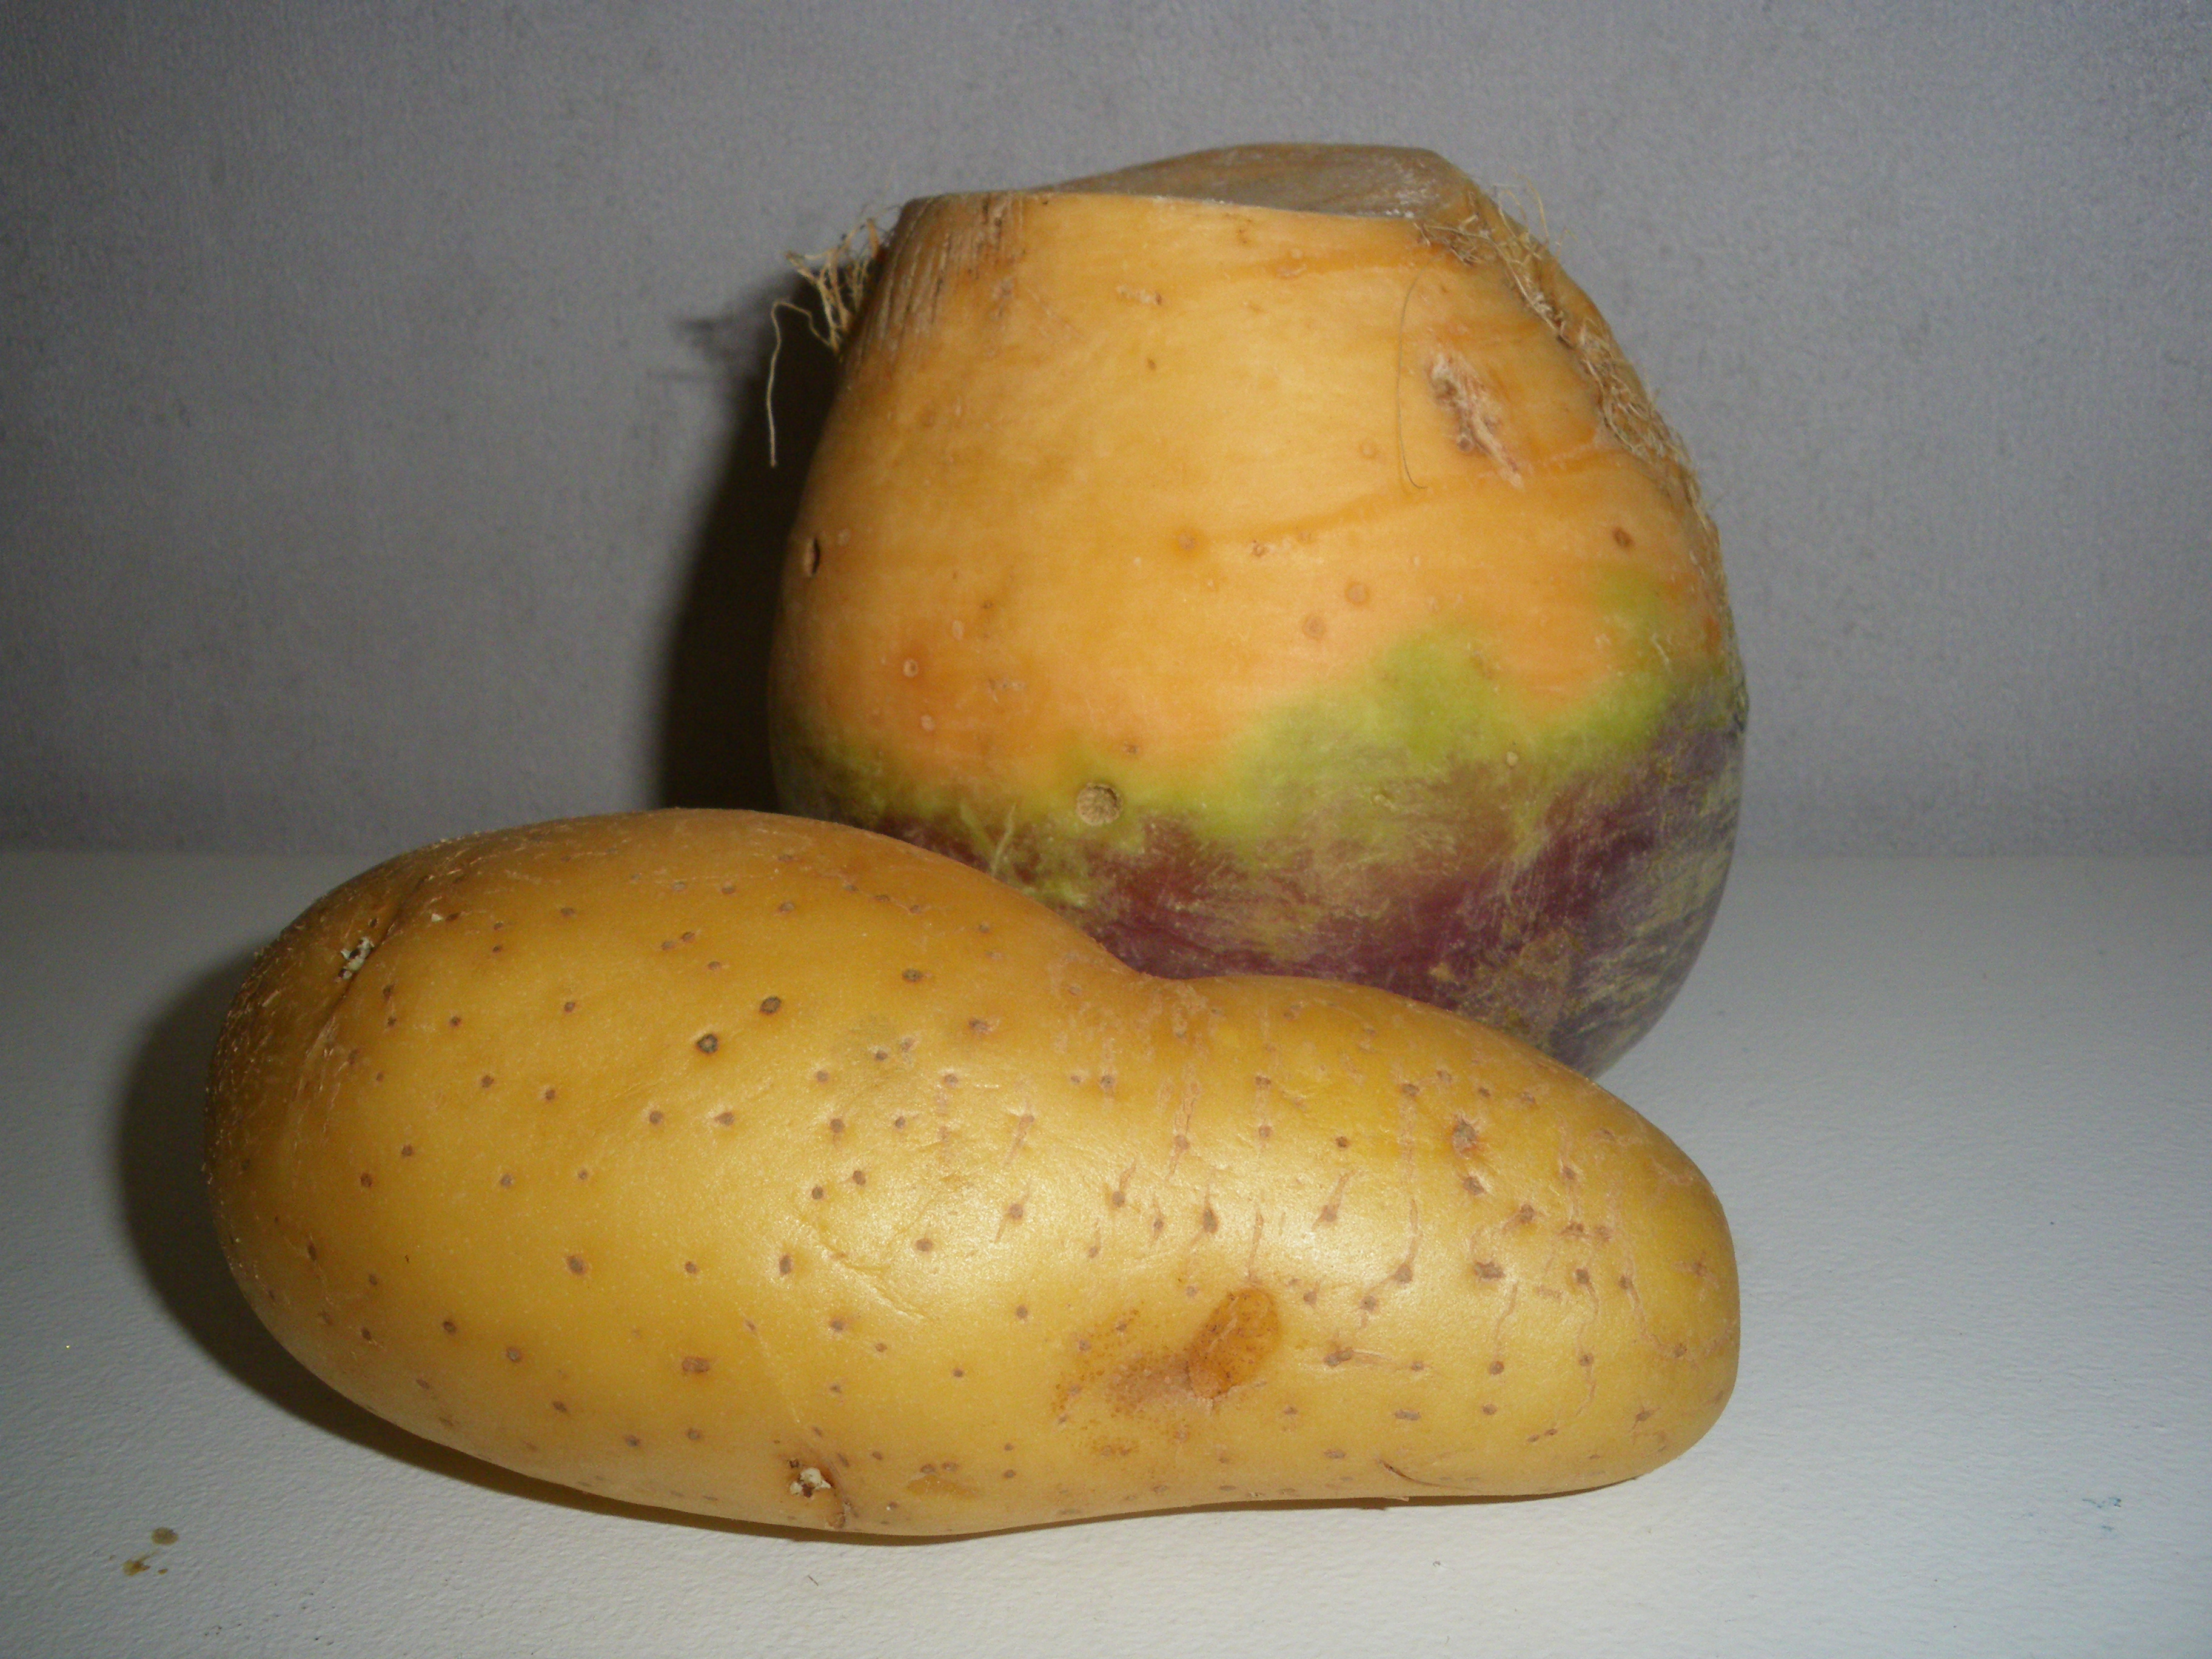 Rutabaga pomme de terre